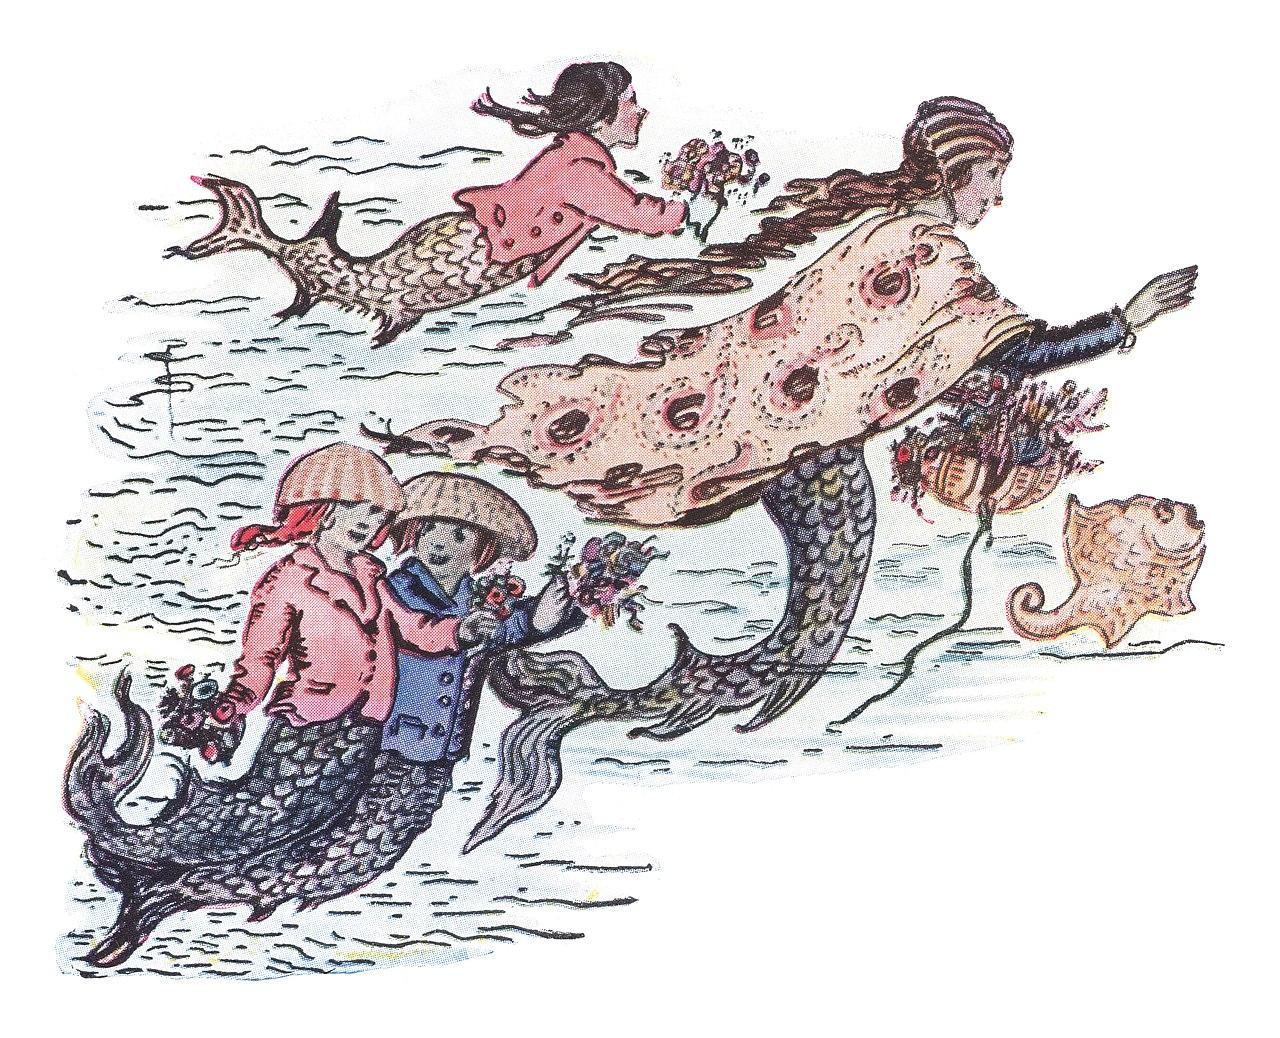 Illustration of mermaids